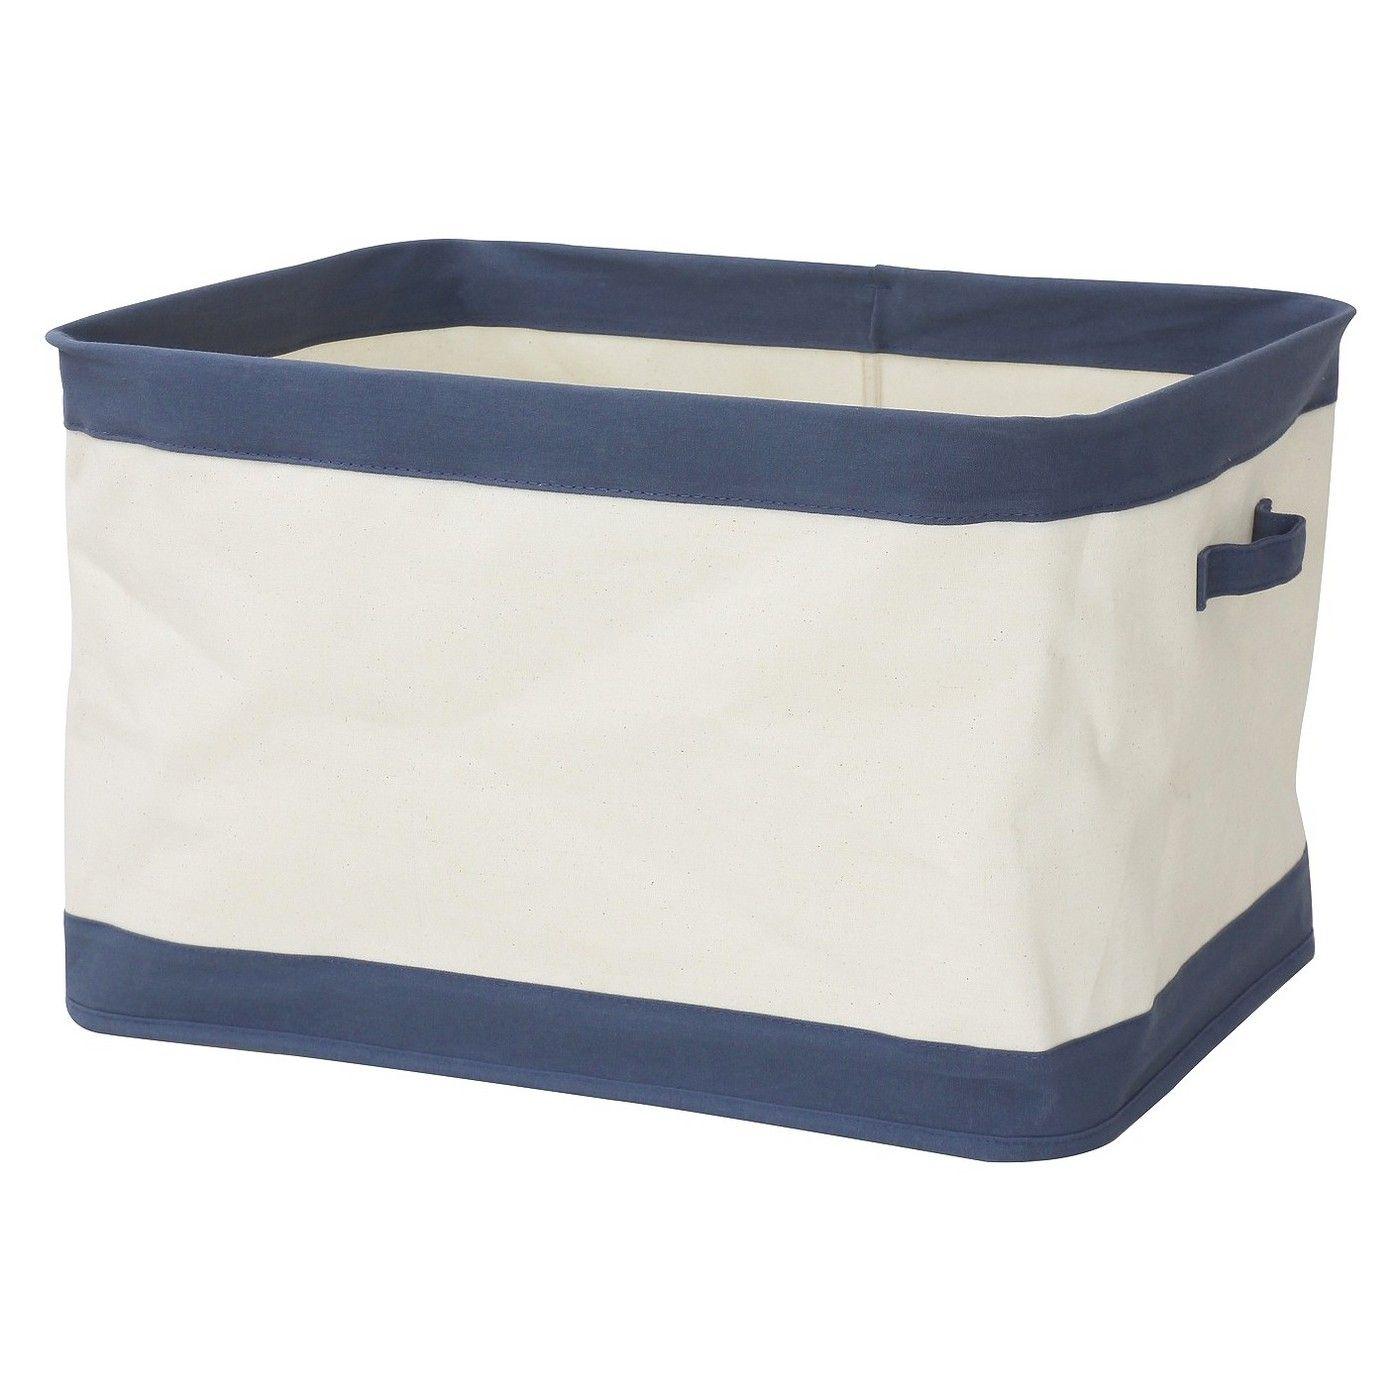 Large Collapsible Canvas Toy Storage Bin Navy Pillowfort Blue White Toy Storage Bins Storage Bins Fabric Storage Bins